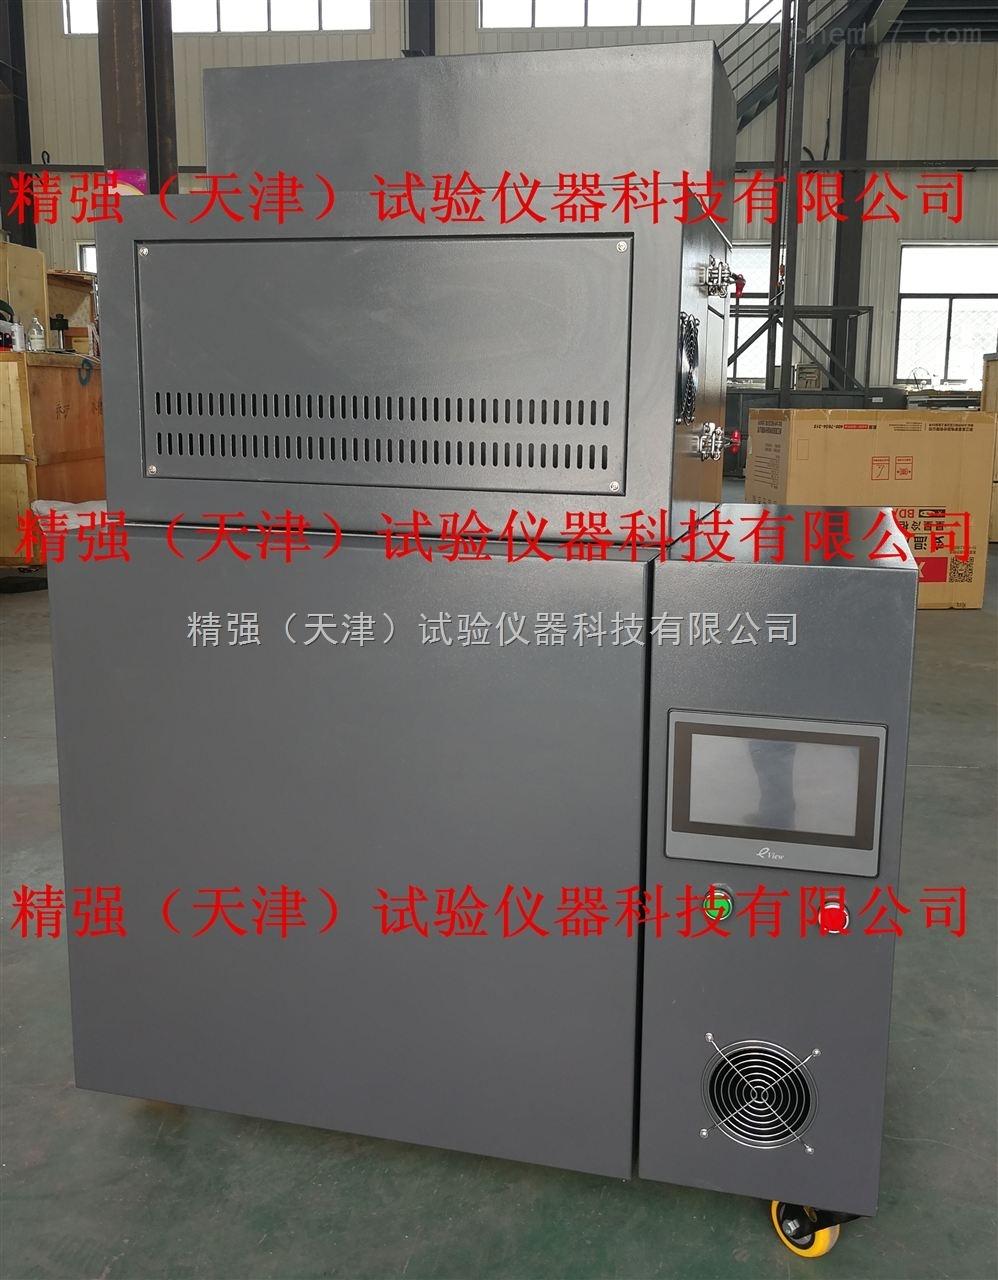 JQLQQX-1-沥青高温清洗机